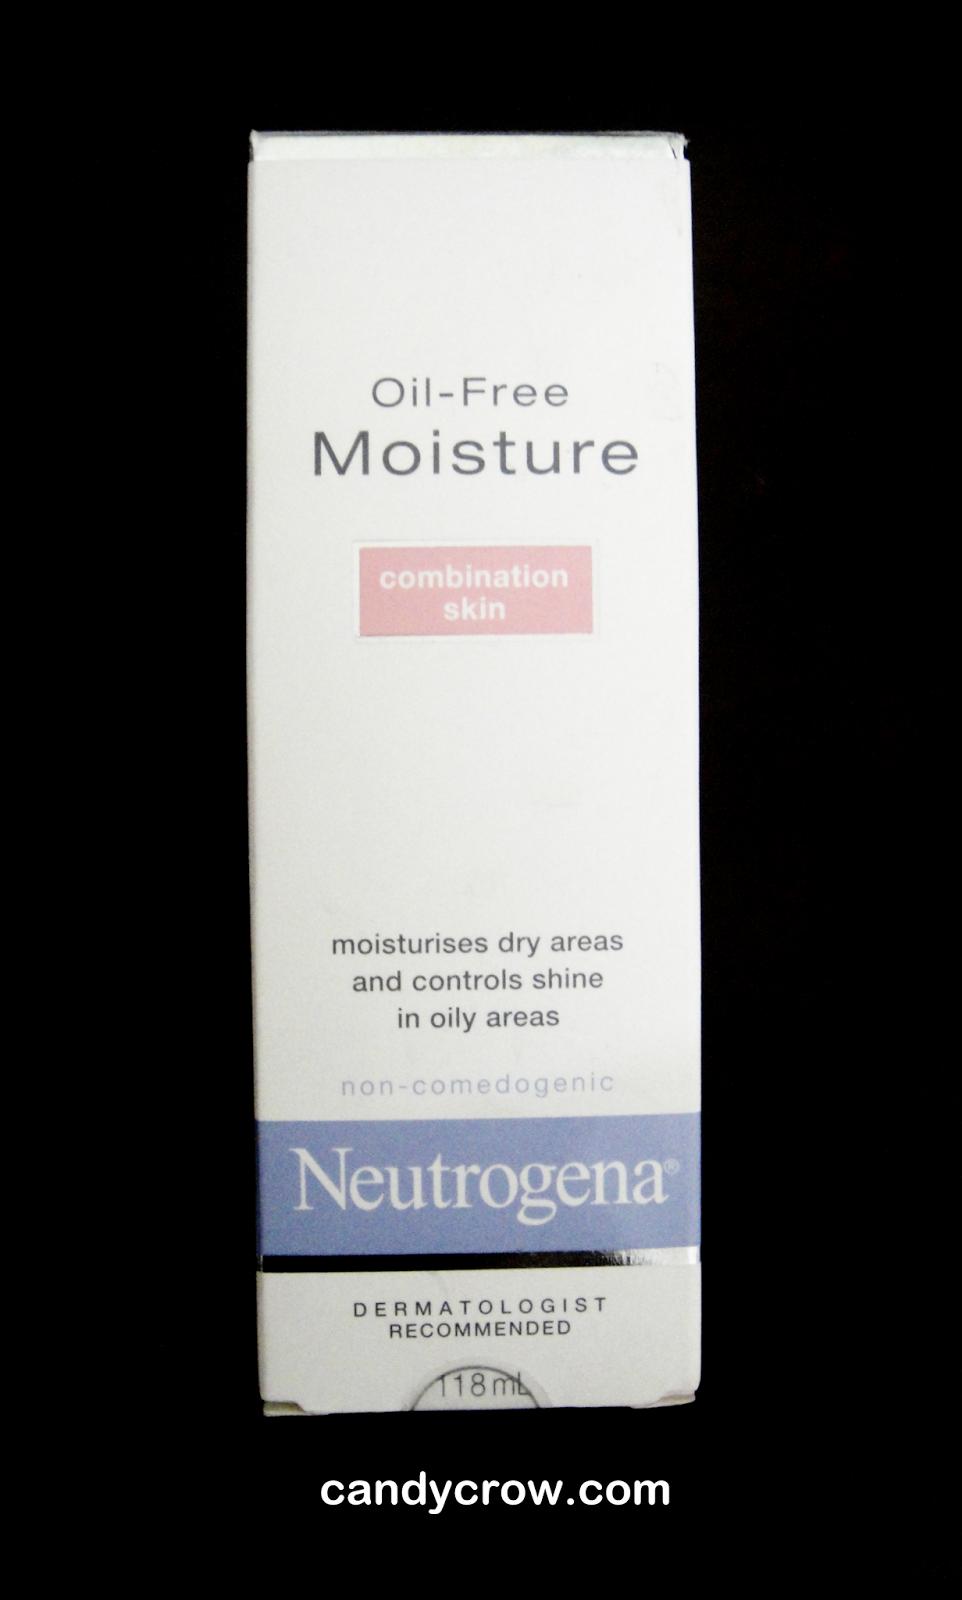 neutrogena healthy skin rejuvenator instructions